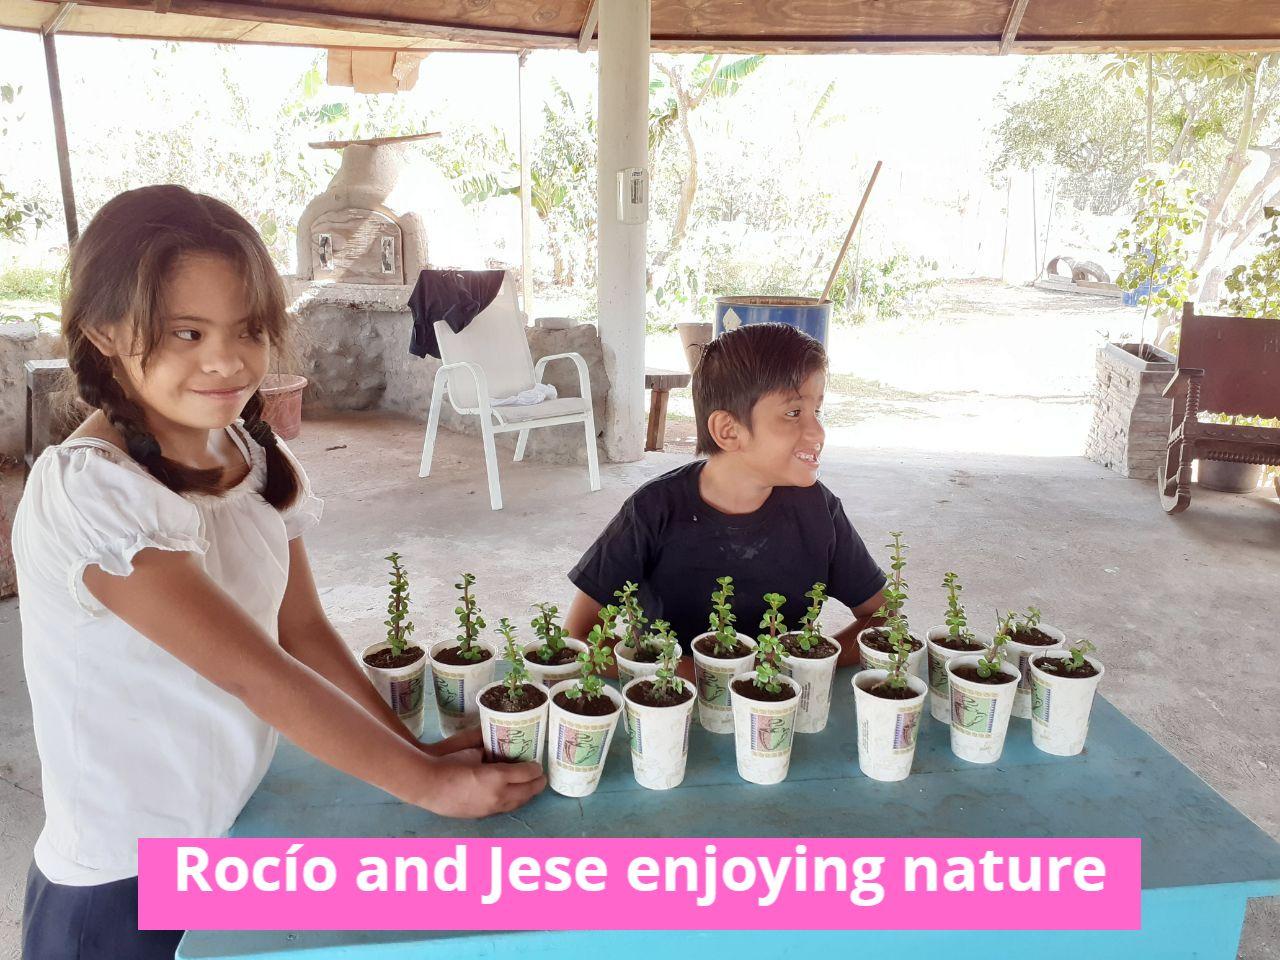 Rocio and Jese enjoying nature